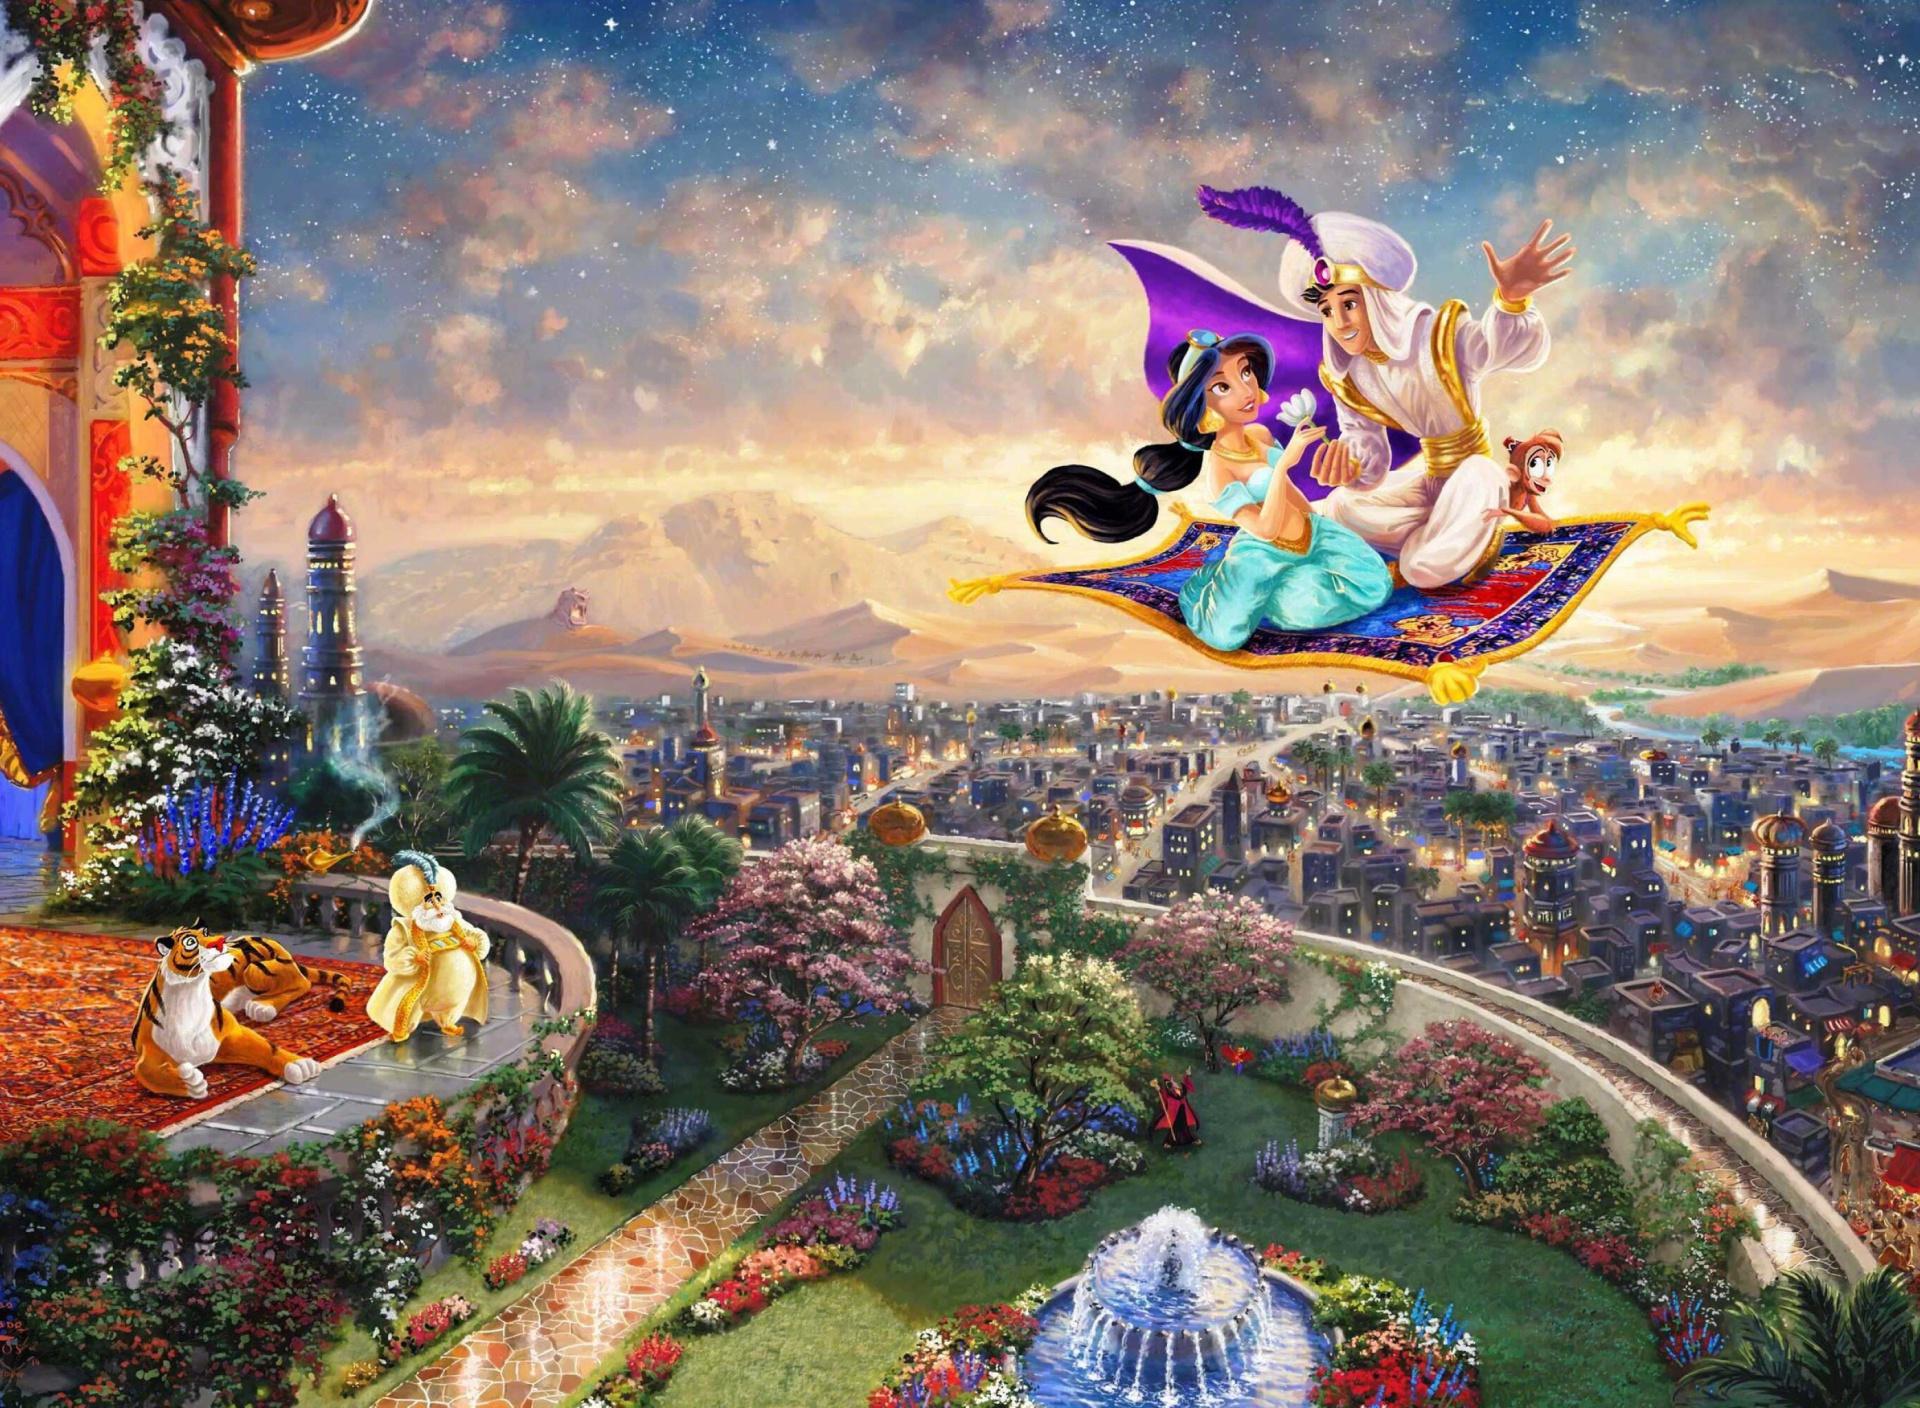 Волшебную сказку с картинками